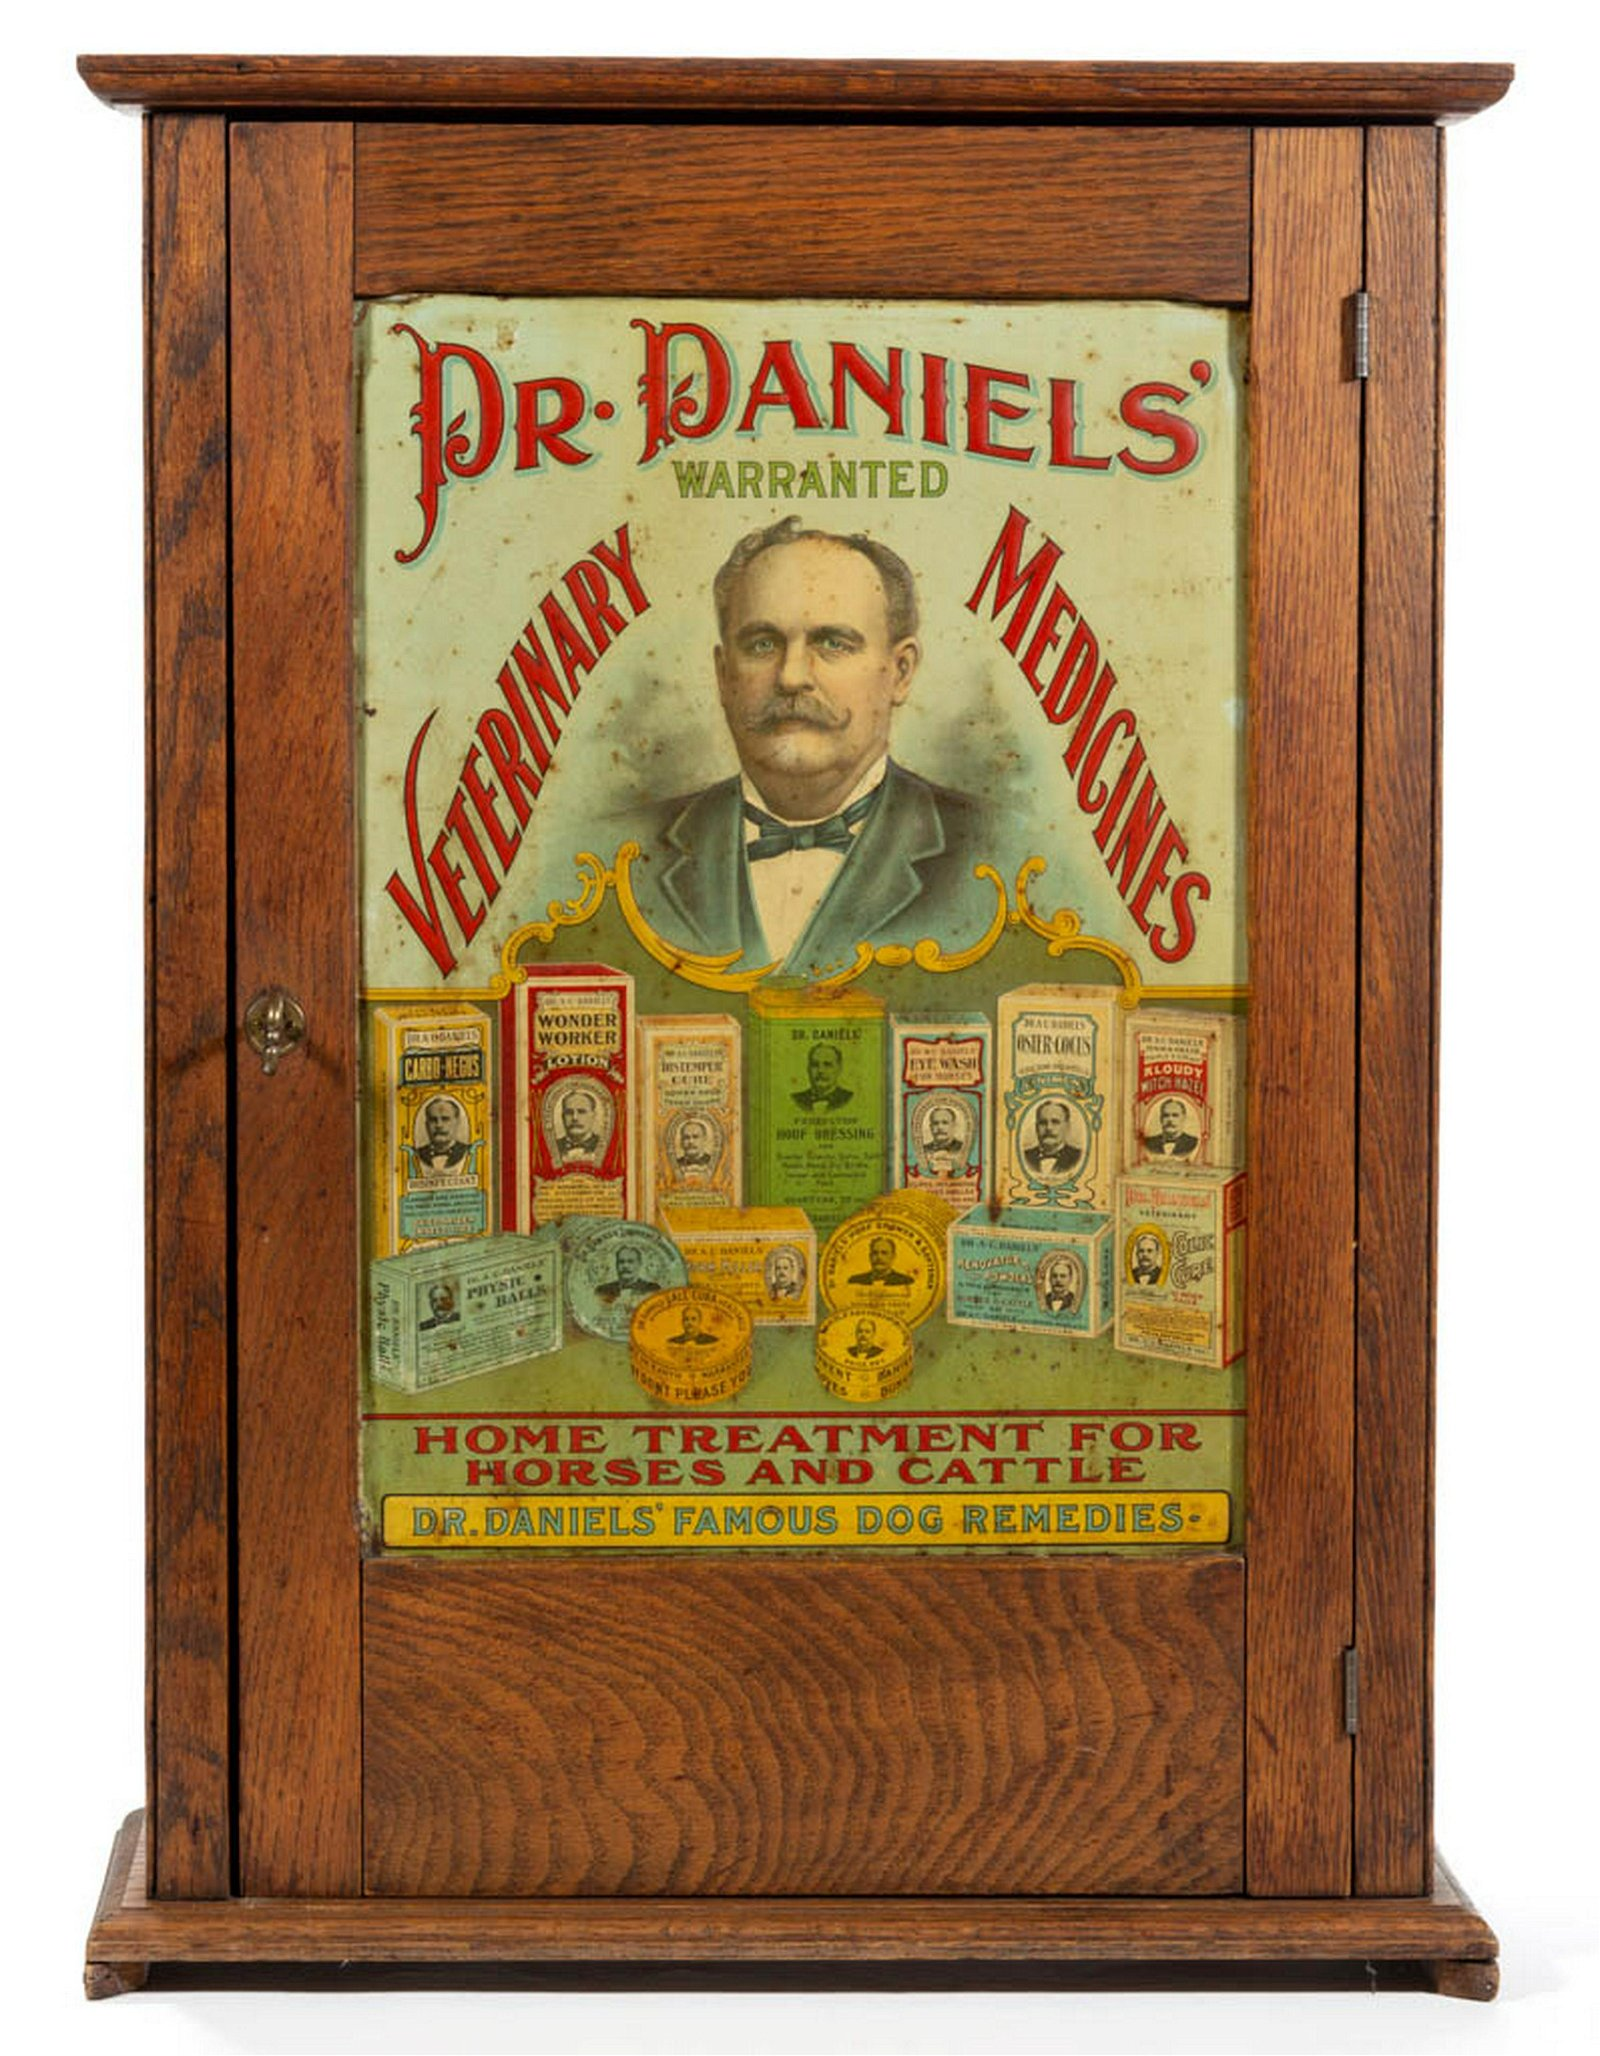 DR. DANIELS VETERINARY MEDICINE ADVERTISING STORE